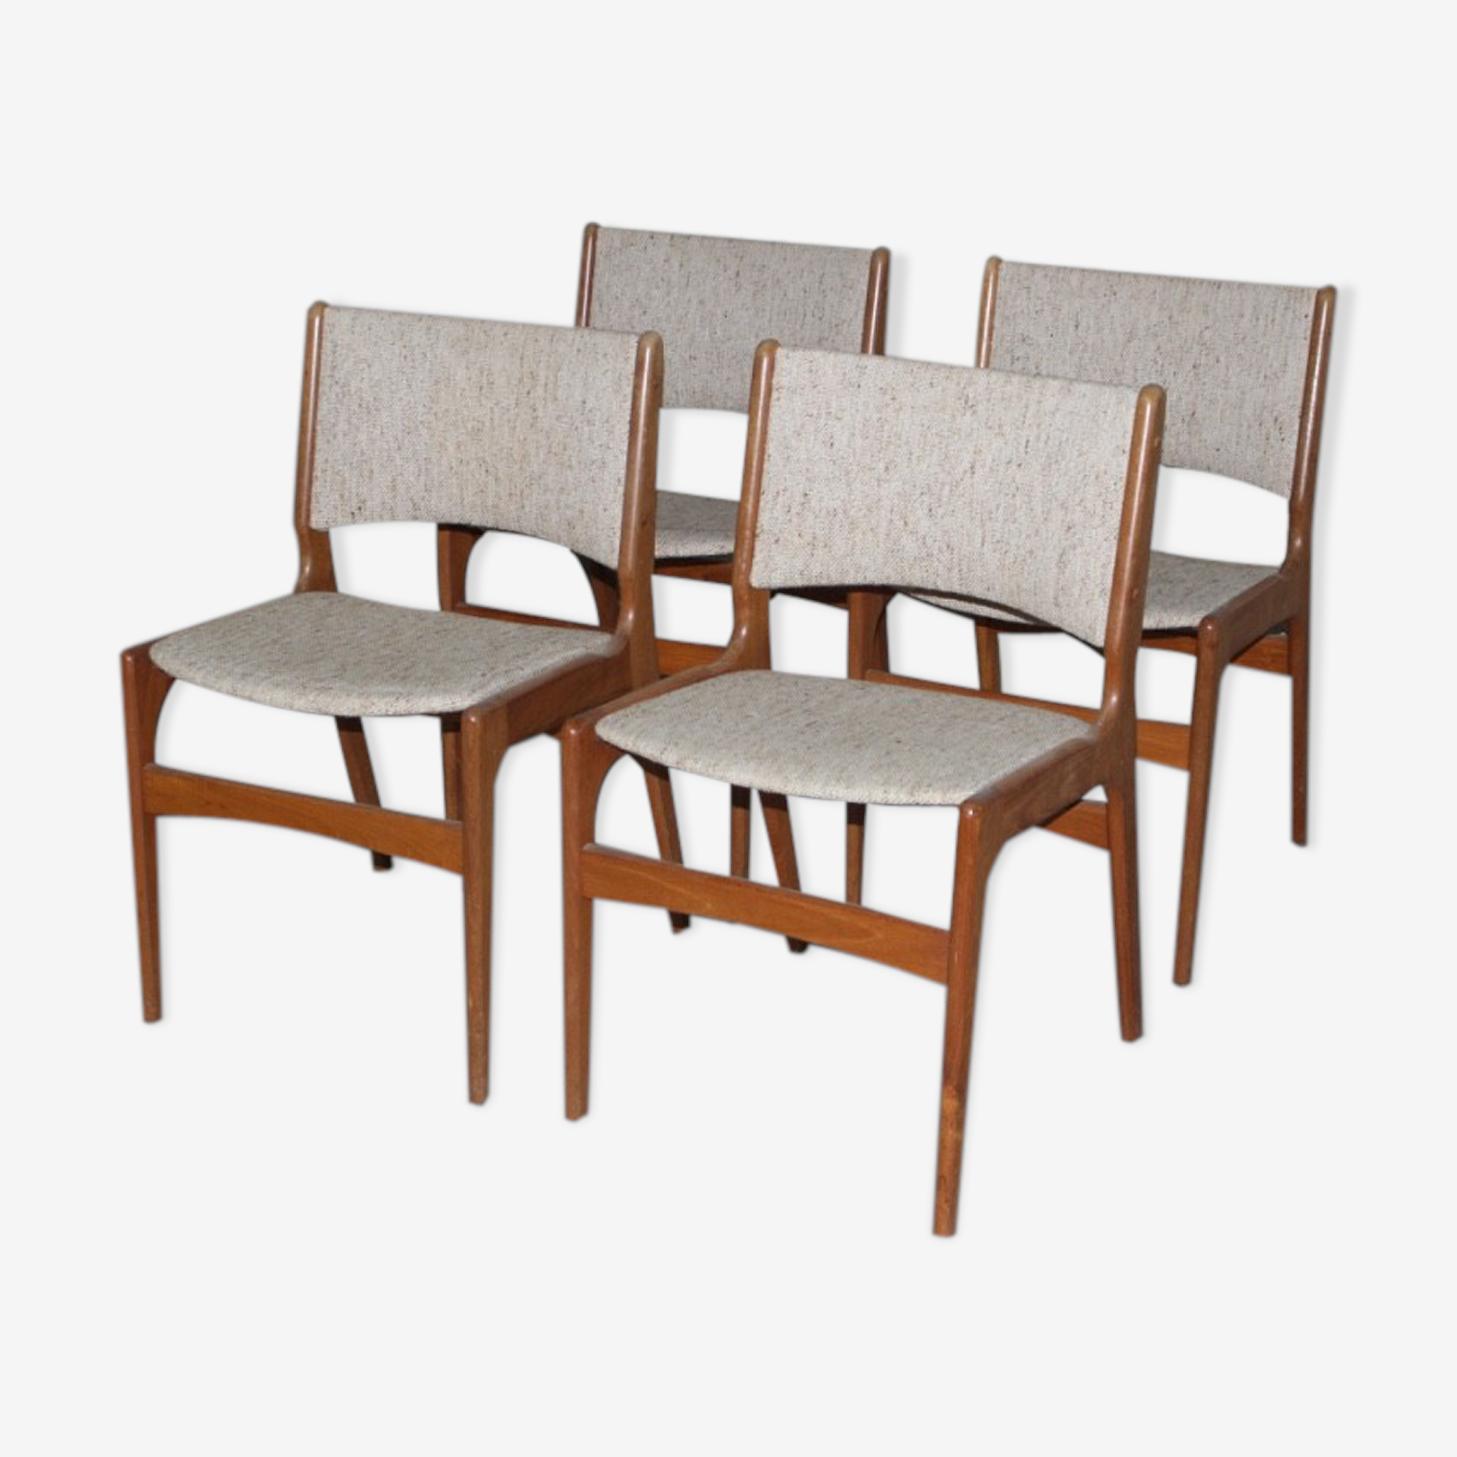 Set of 4 Scandinavian vintage teak chairs, model 89 by Erik Buch for Anderstrup Møbelfabrik, 1960 s, to restore